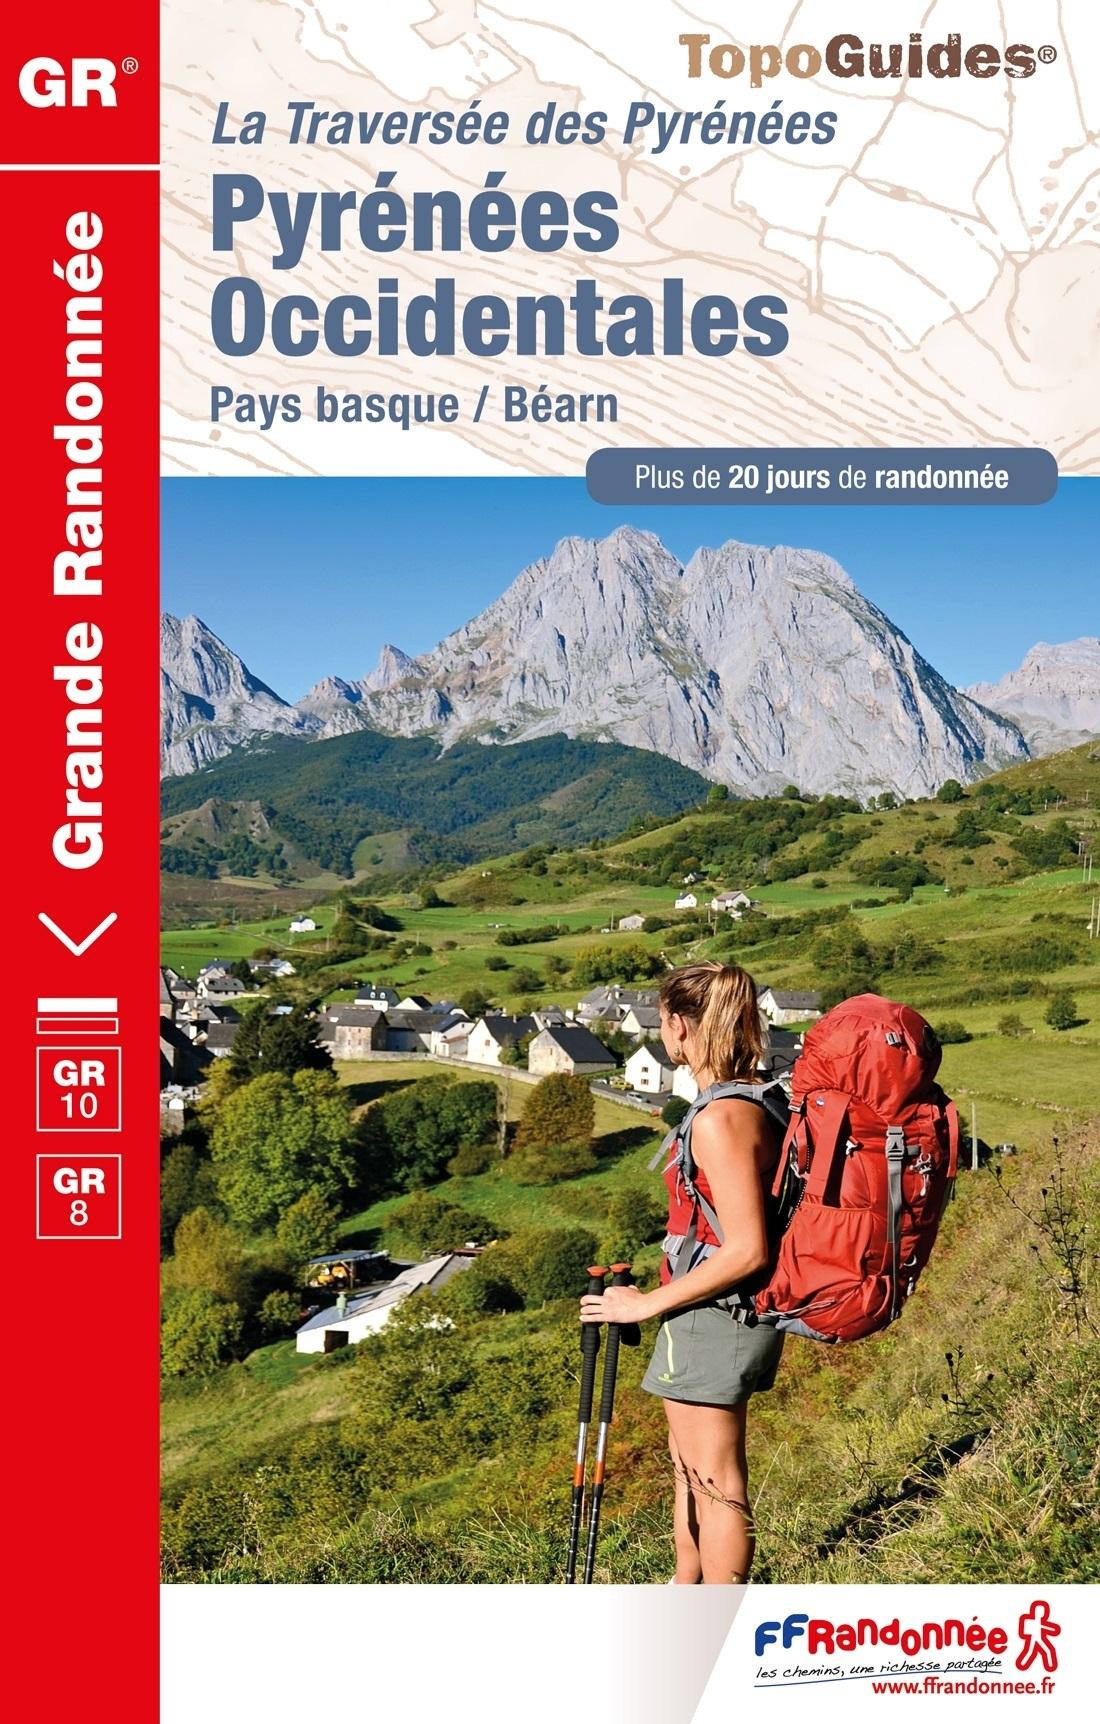 TG1086 Pyrénées Occidentales | wandelgids GR-10 9782751409844  FFRP Topoguides  Meerdaagse wandelroutes, Wandelgidsen Baskenland, Franse Pyreneeën